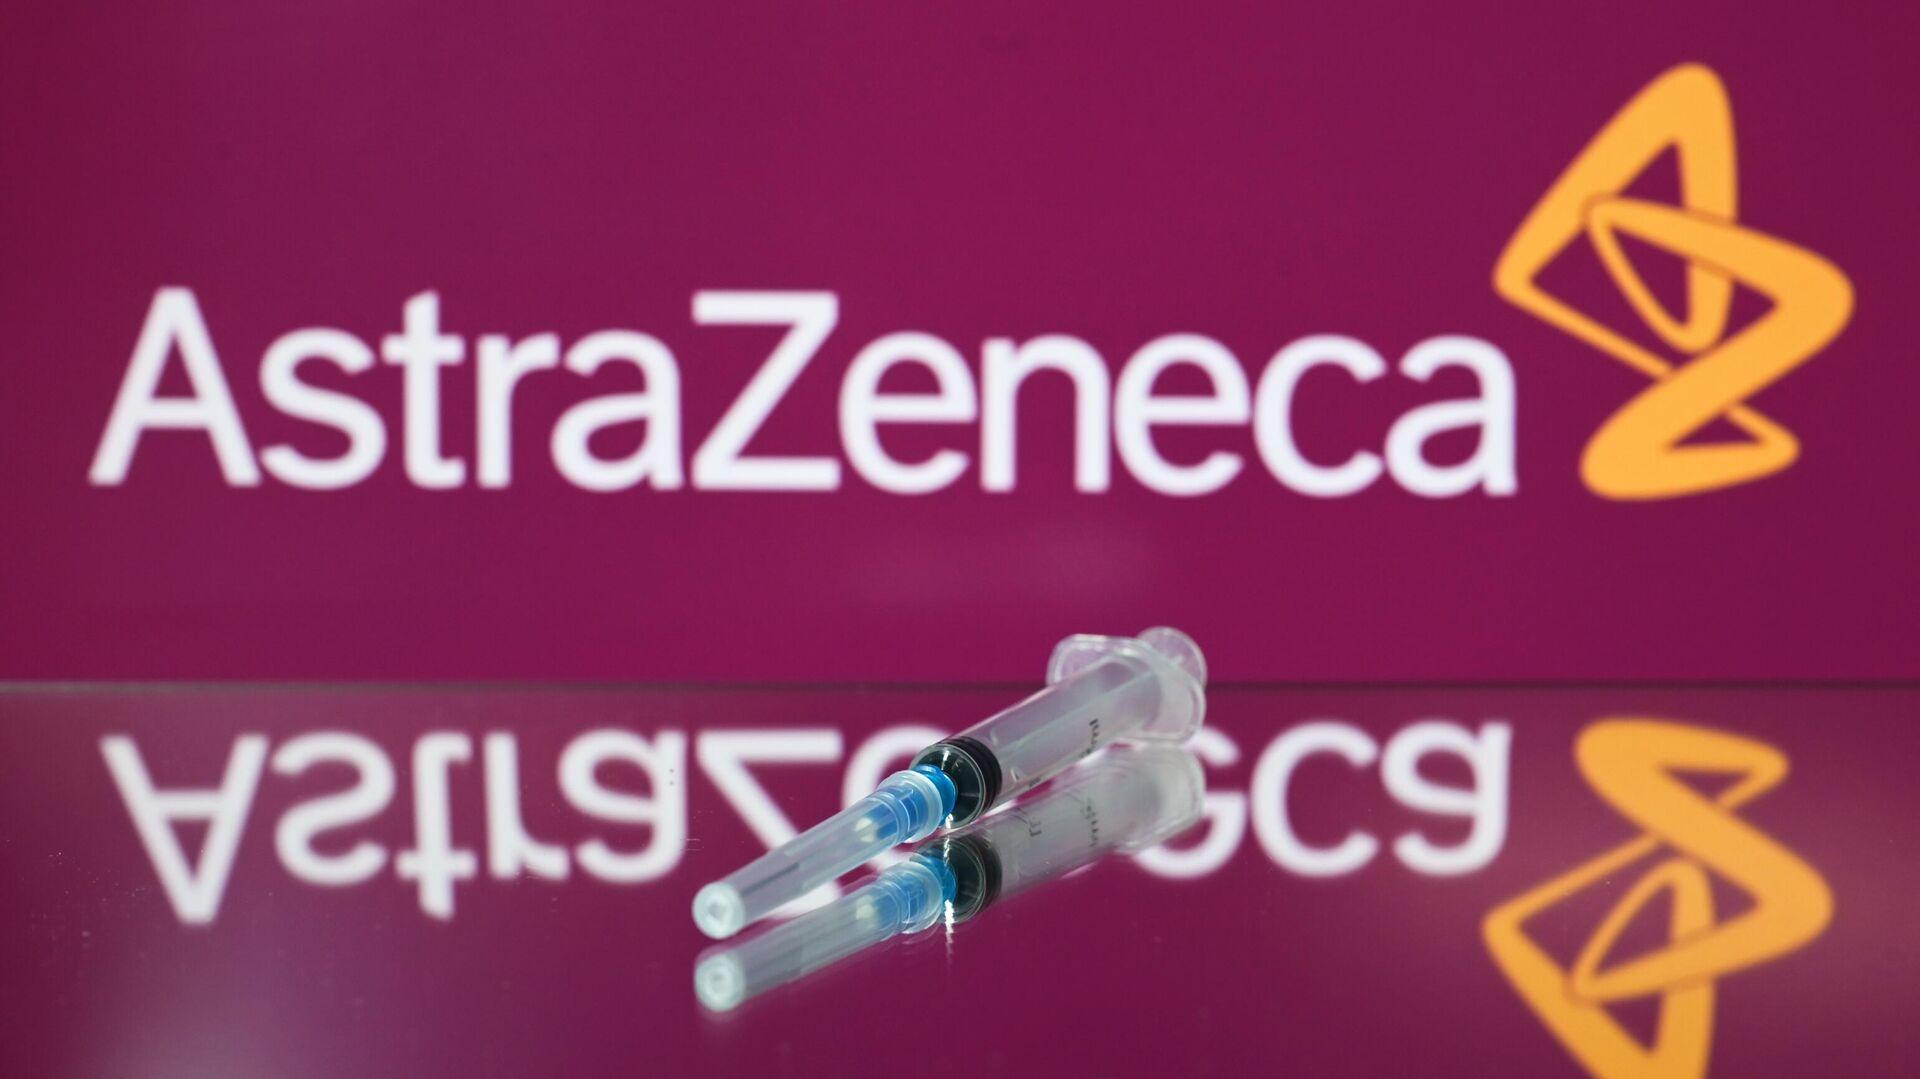 Вакцина от коронавируса британо-шведской компании AstraZeneca и Оксфордского университета - РИА Новости, 1920, 11.03.2021